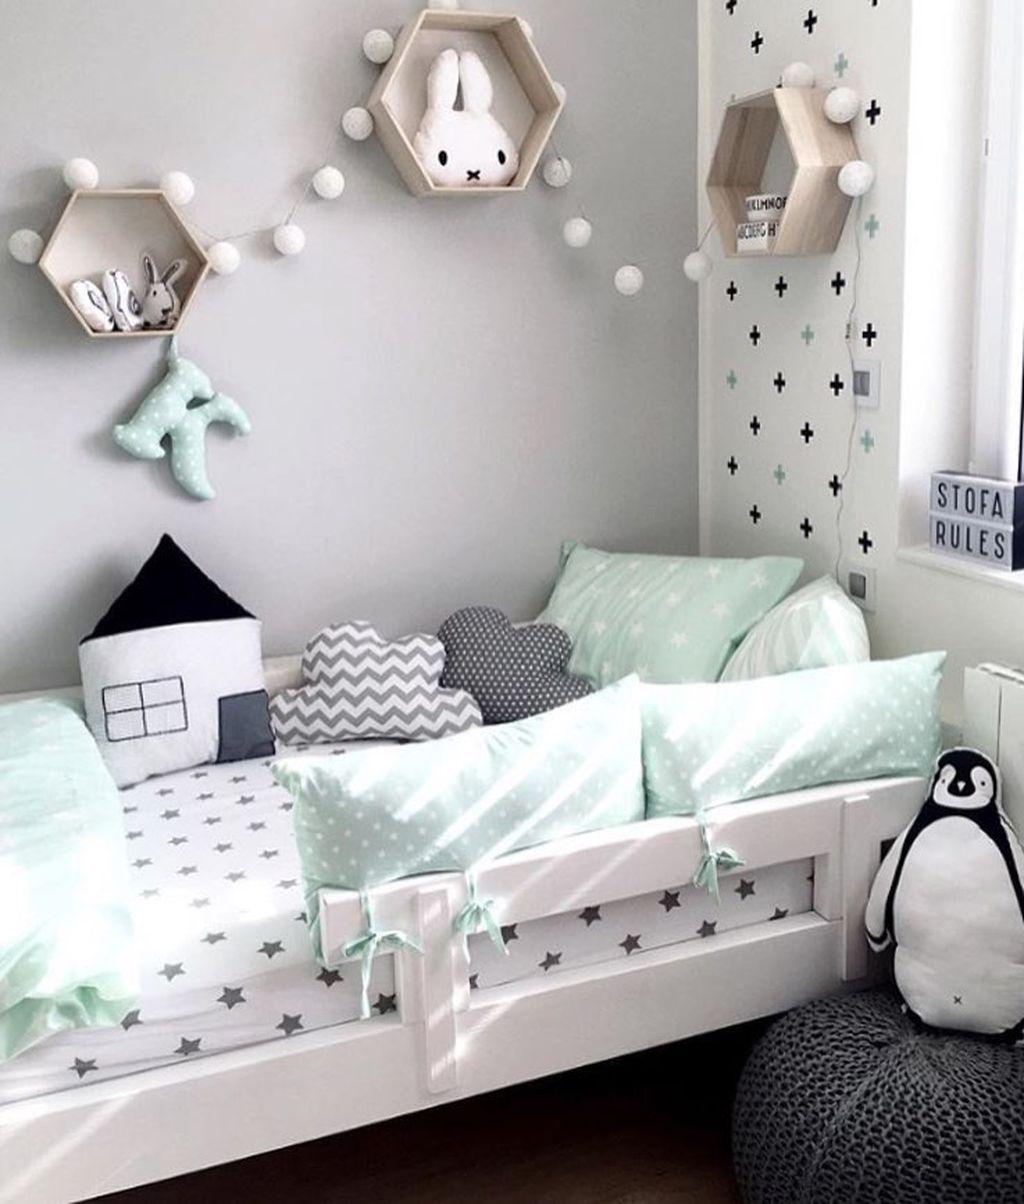 30 Modern Scandinavian Kids Rooms Designs Ideas With Images